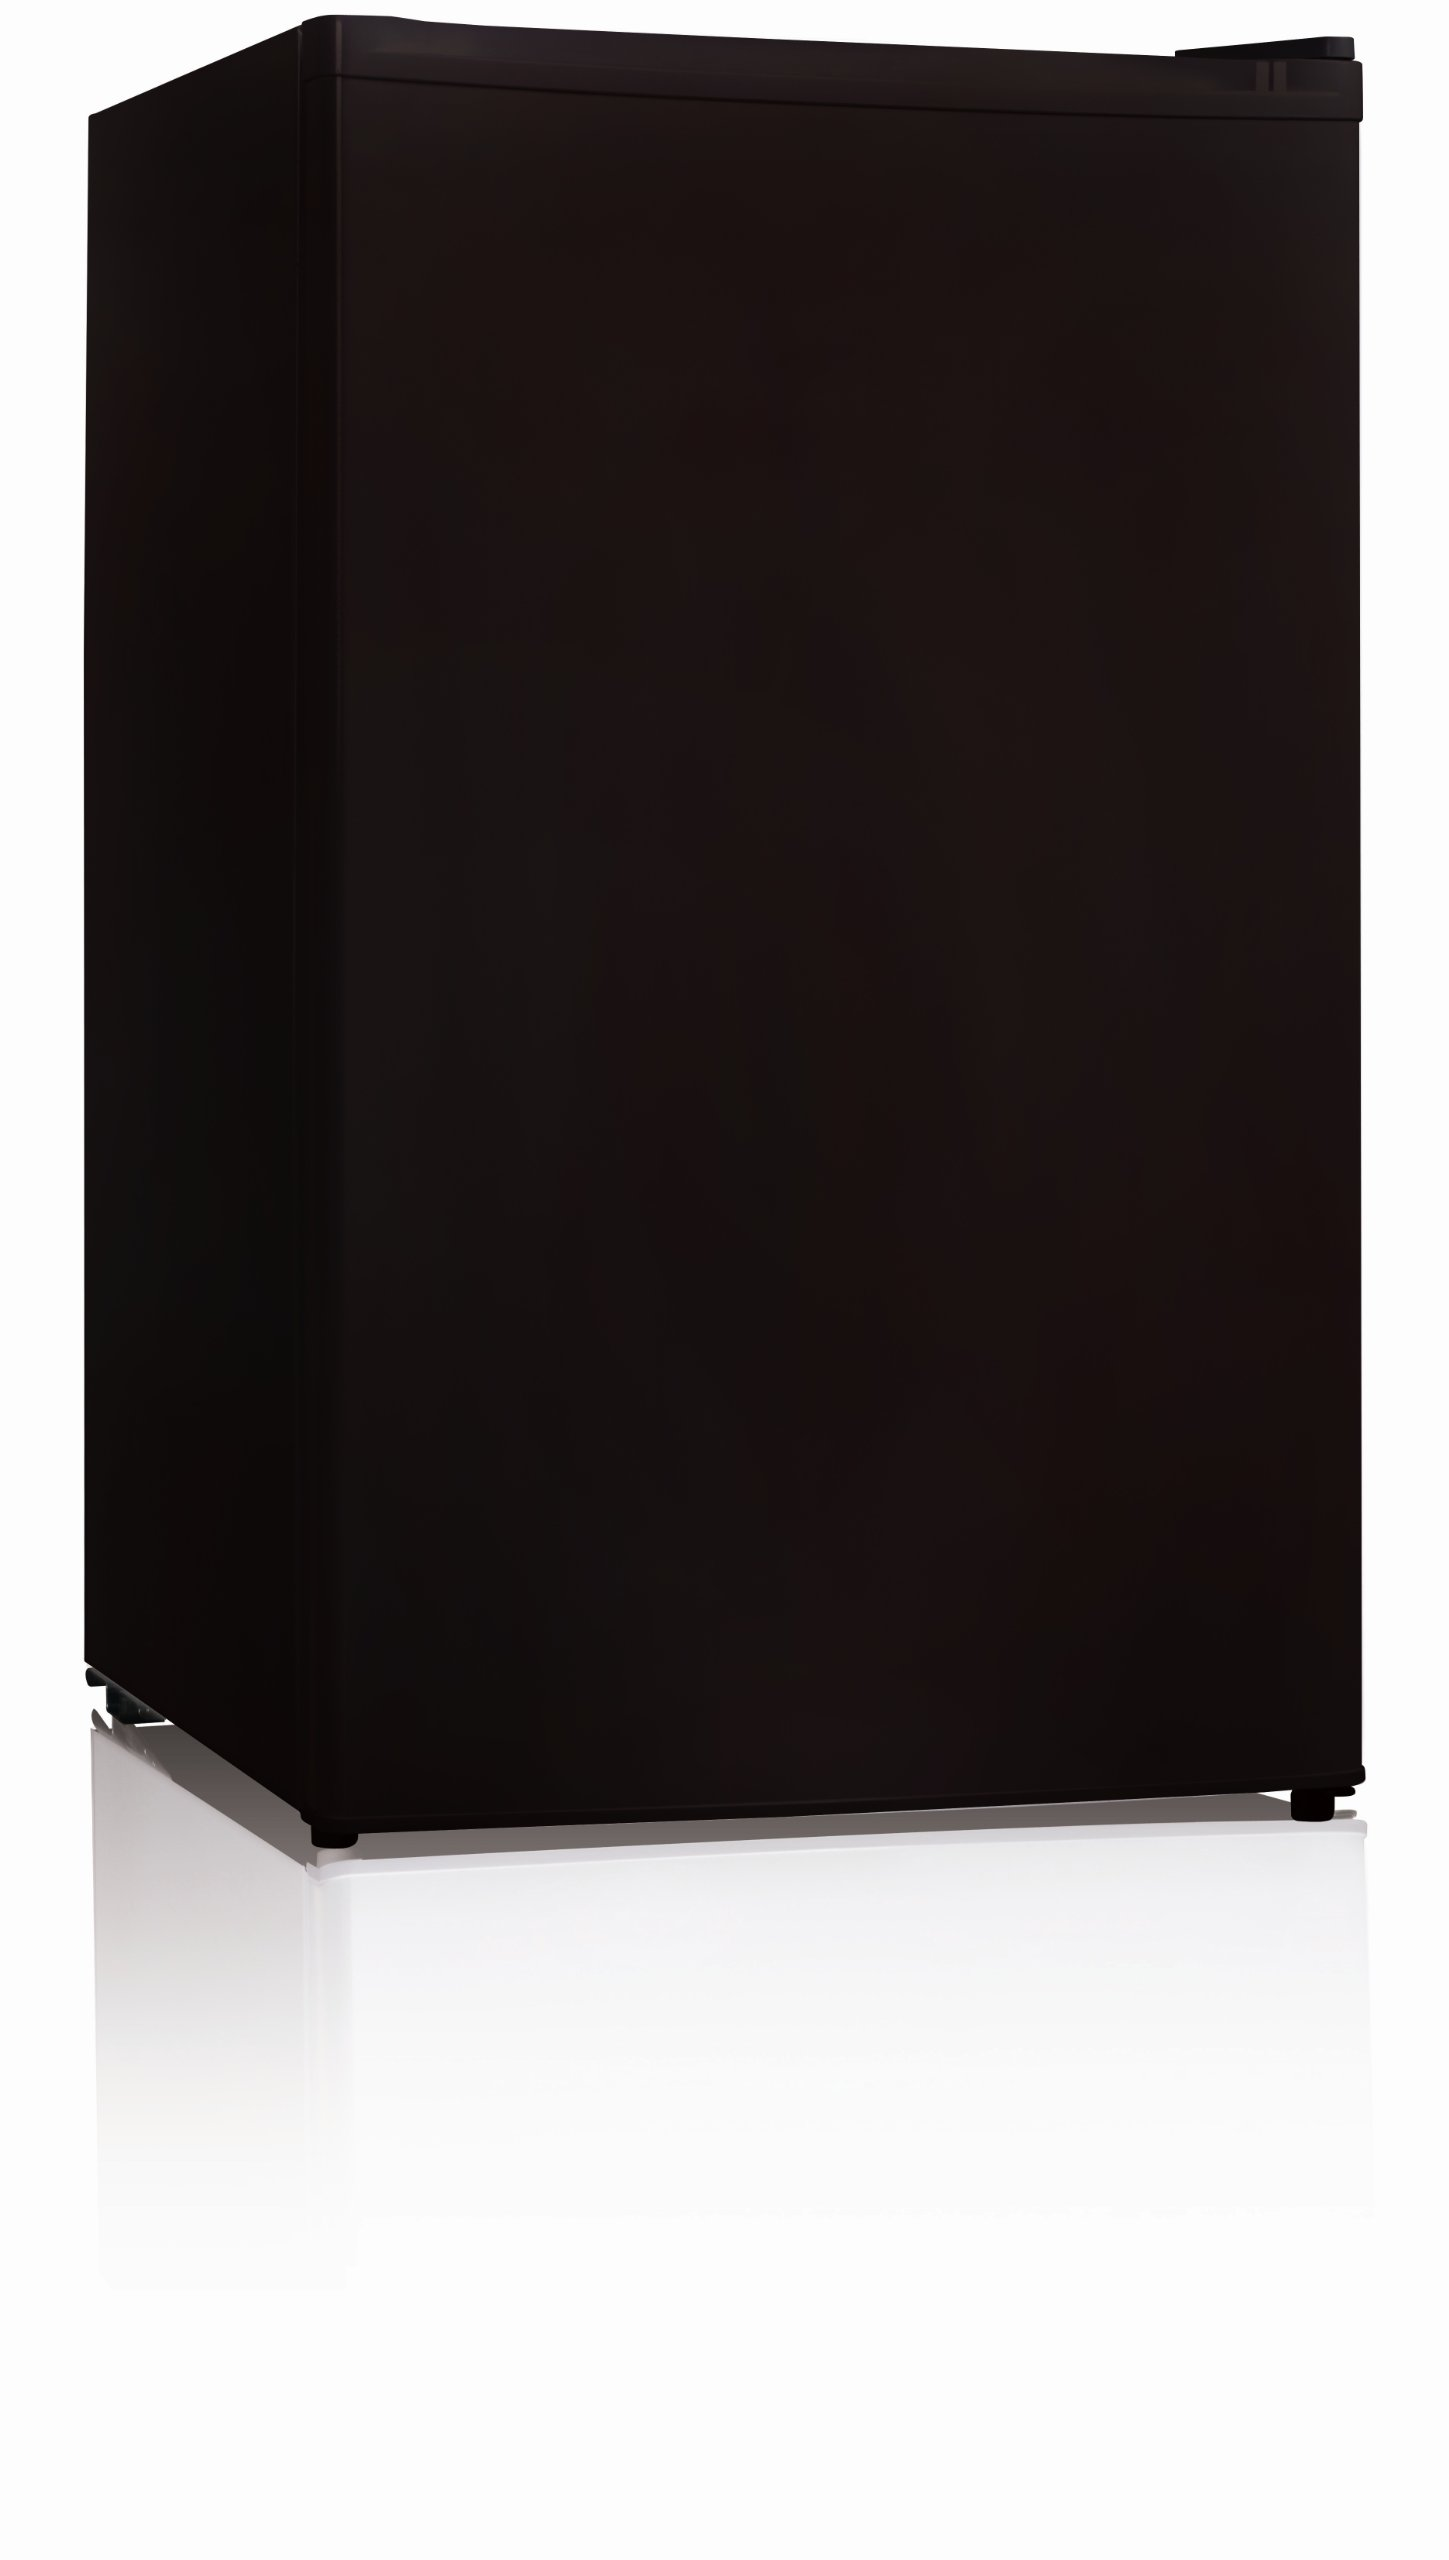 Midea WHS-109FB1 Compact Single Reversible Door Upright Freezer, 3.0 Cubic Feet 61mBuJ0Qc6L